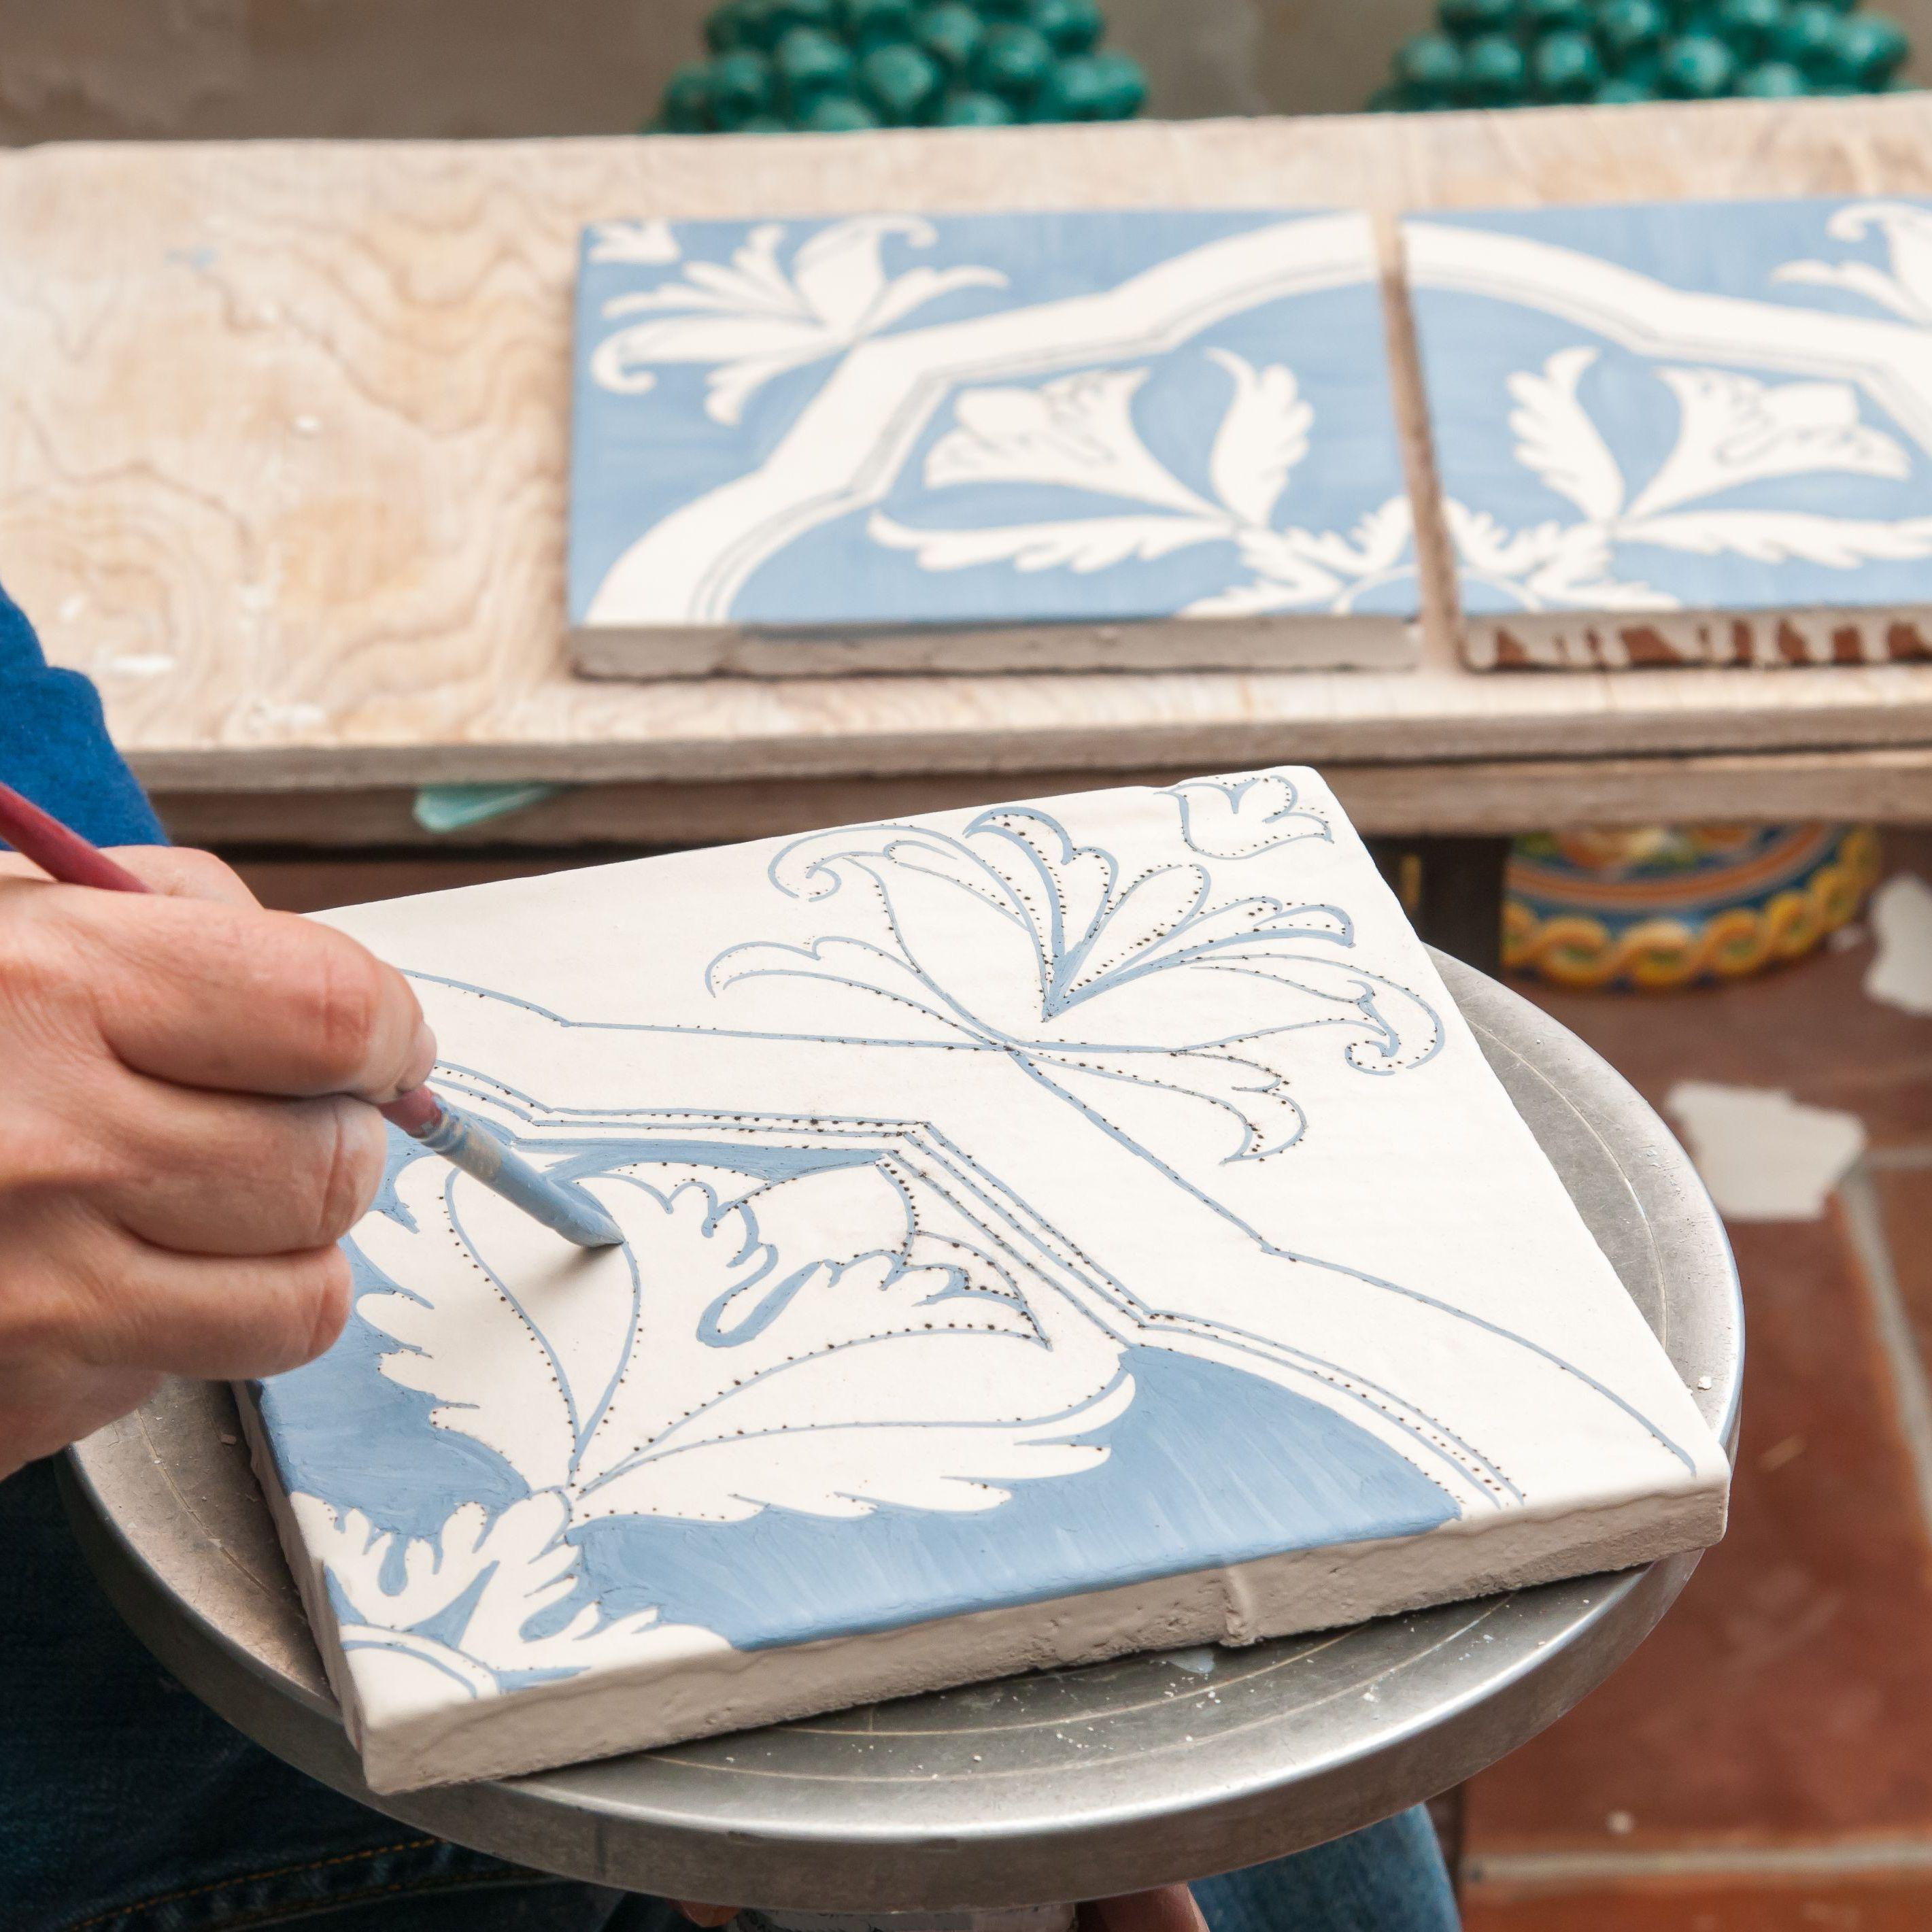 ceramic tile walls and countertops